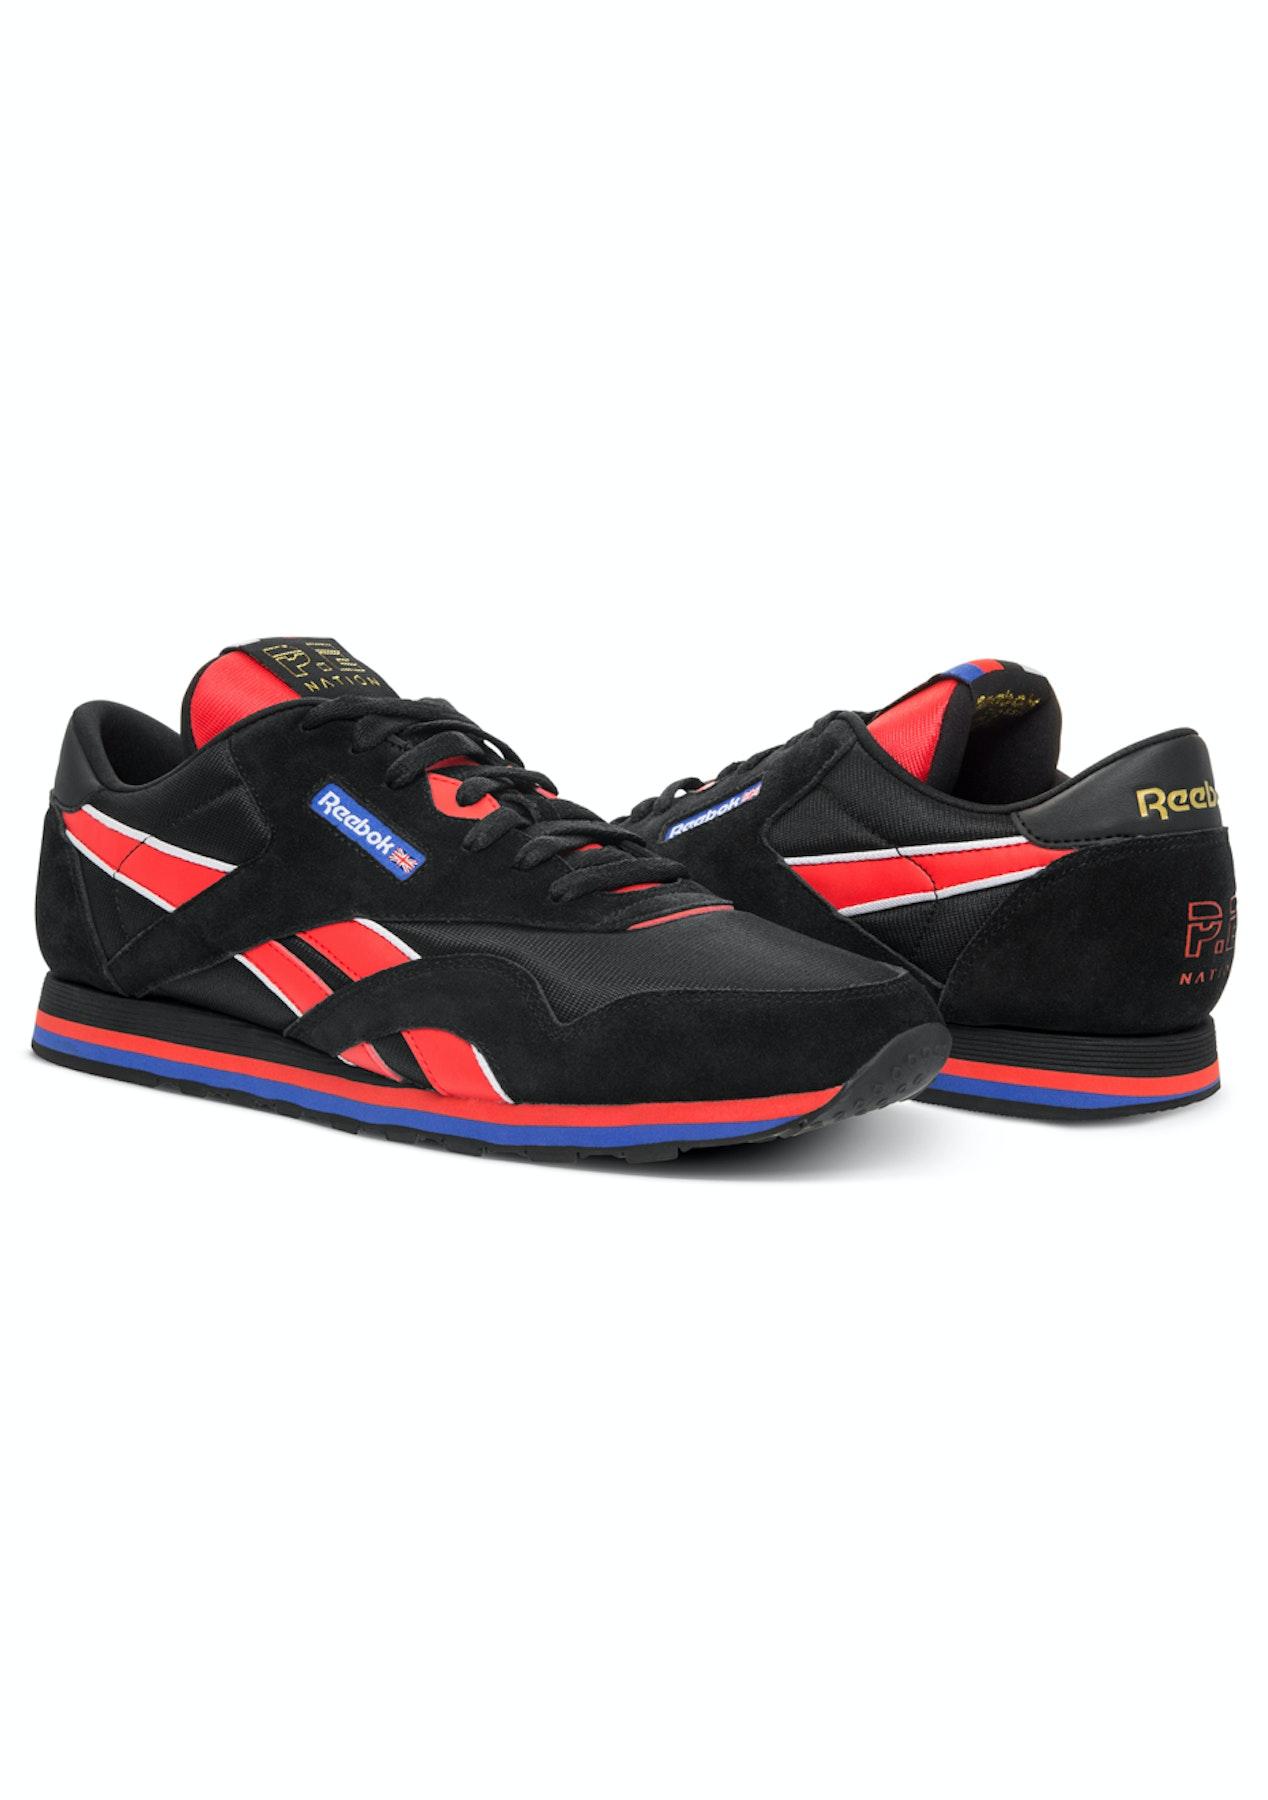 1ddd019218e Reebok x PE Nation Classic Nylon Trainer - Black - Reebok x PENation  Restock - Onceit